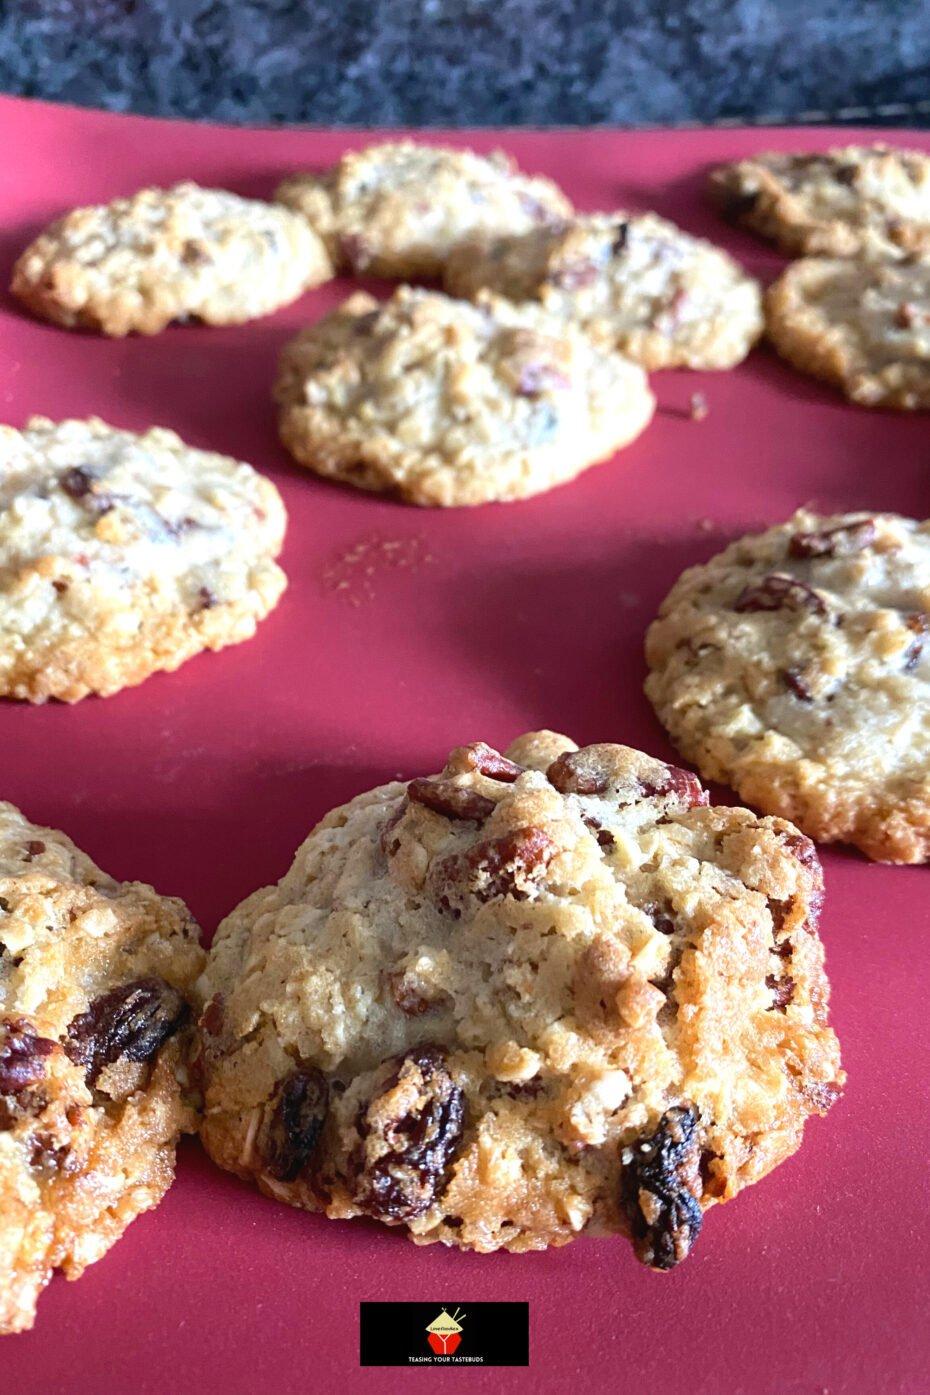 Pecan and Raisin Oatmeal Cookies, baked